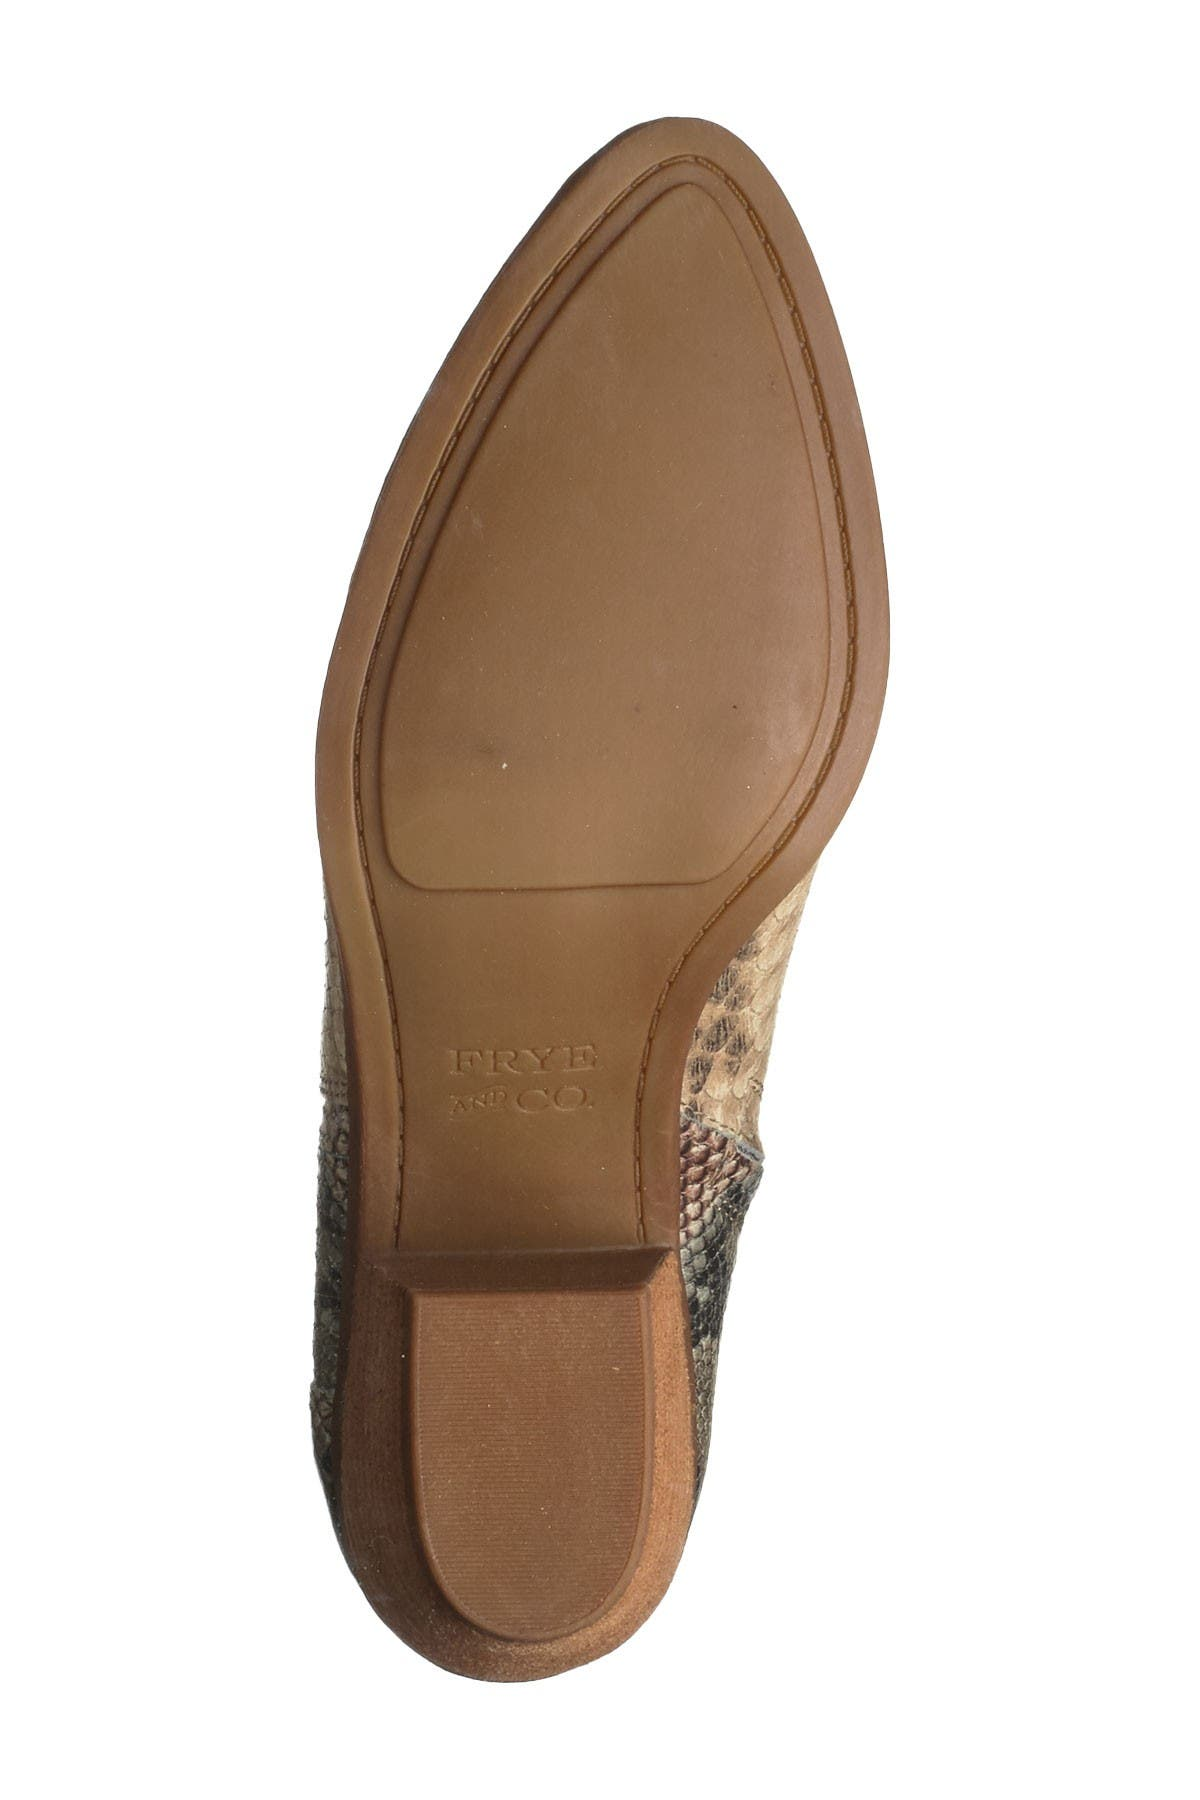 Image of Frye & Co Jacy Chelsea Snake Embossed Boot